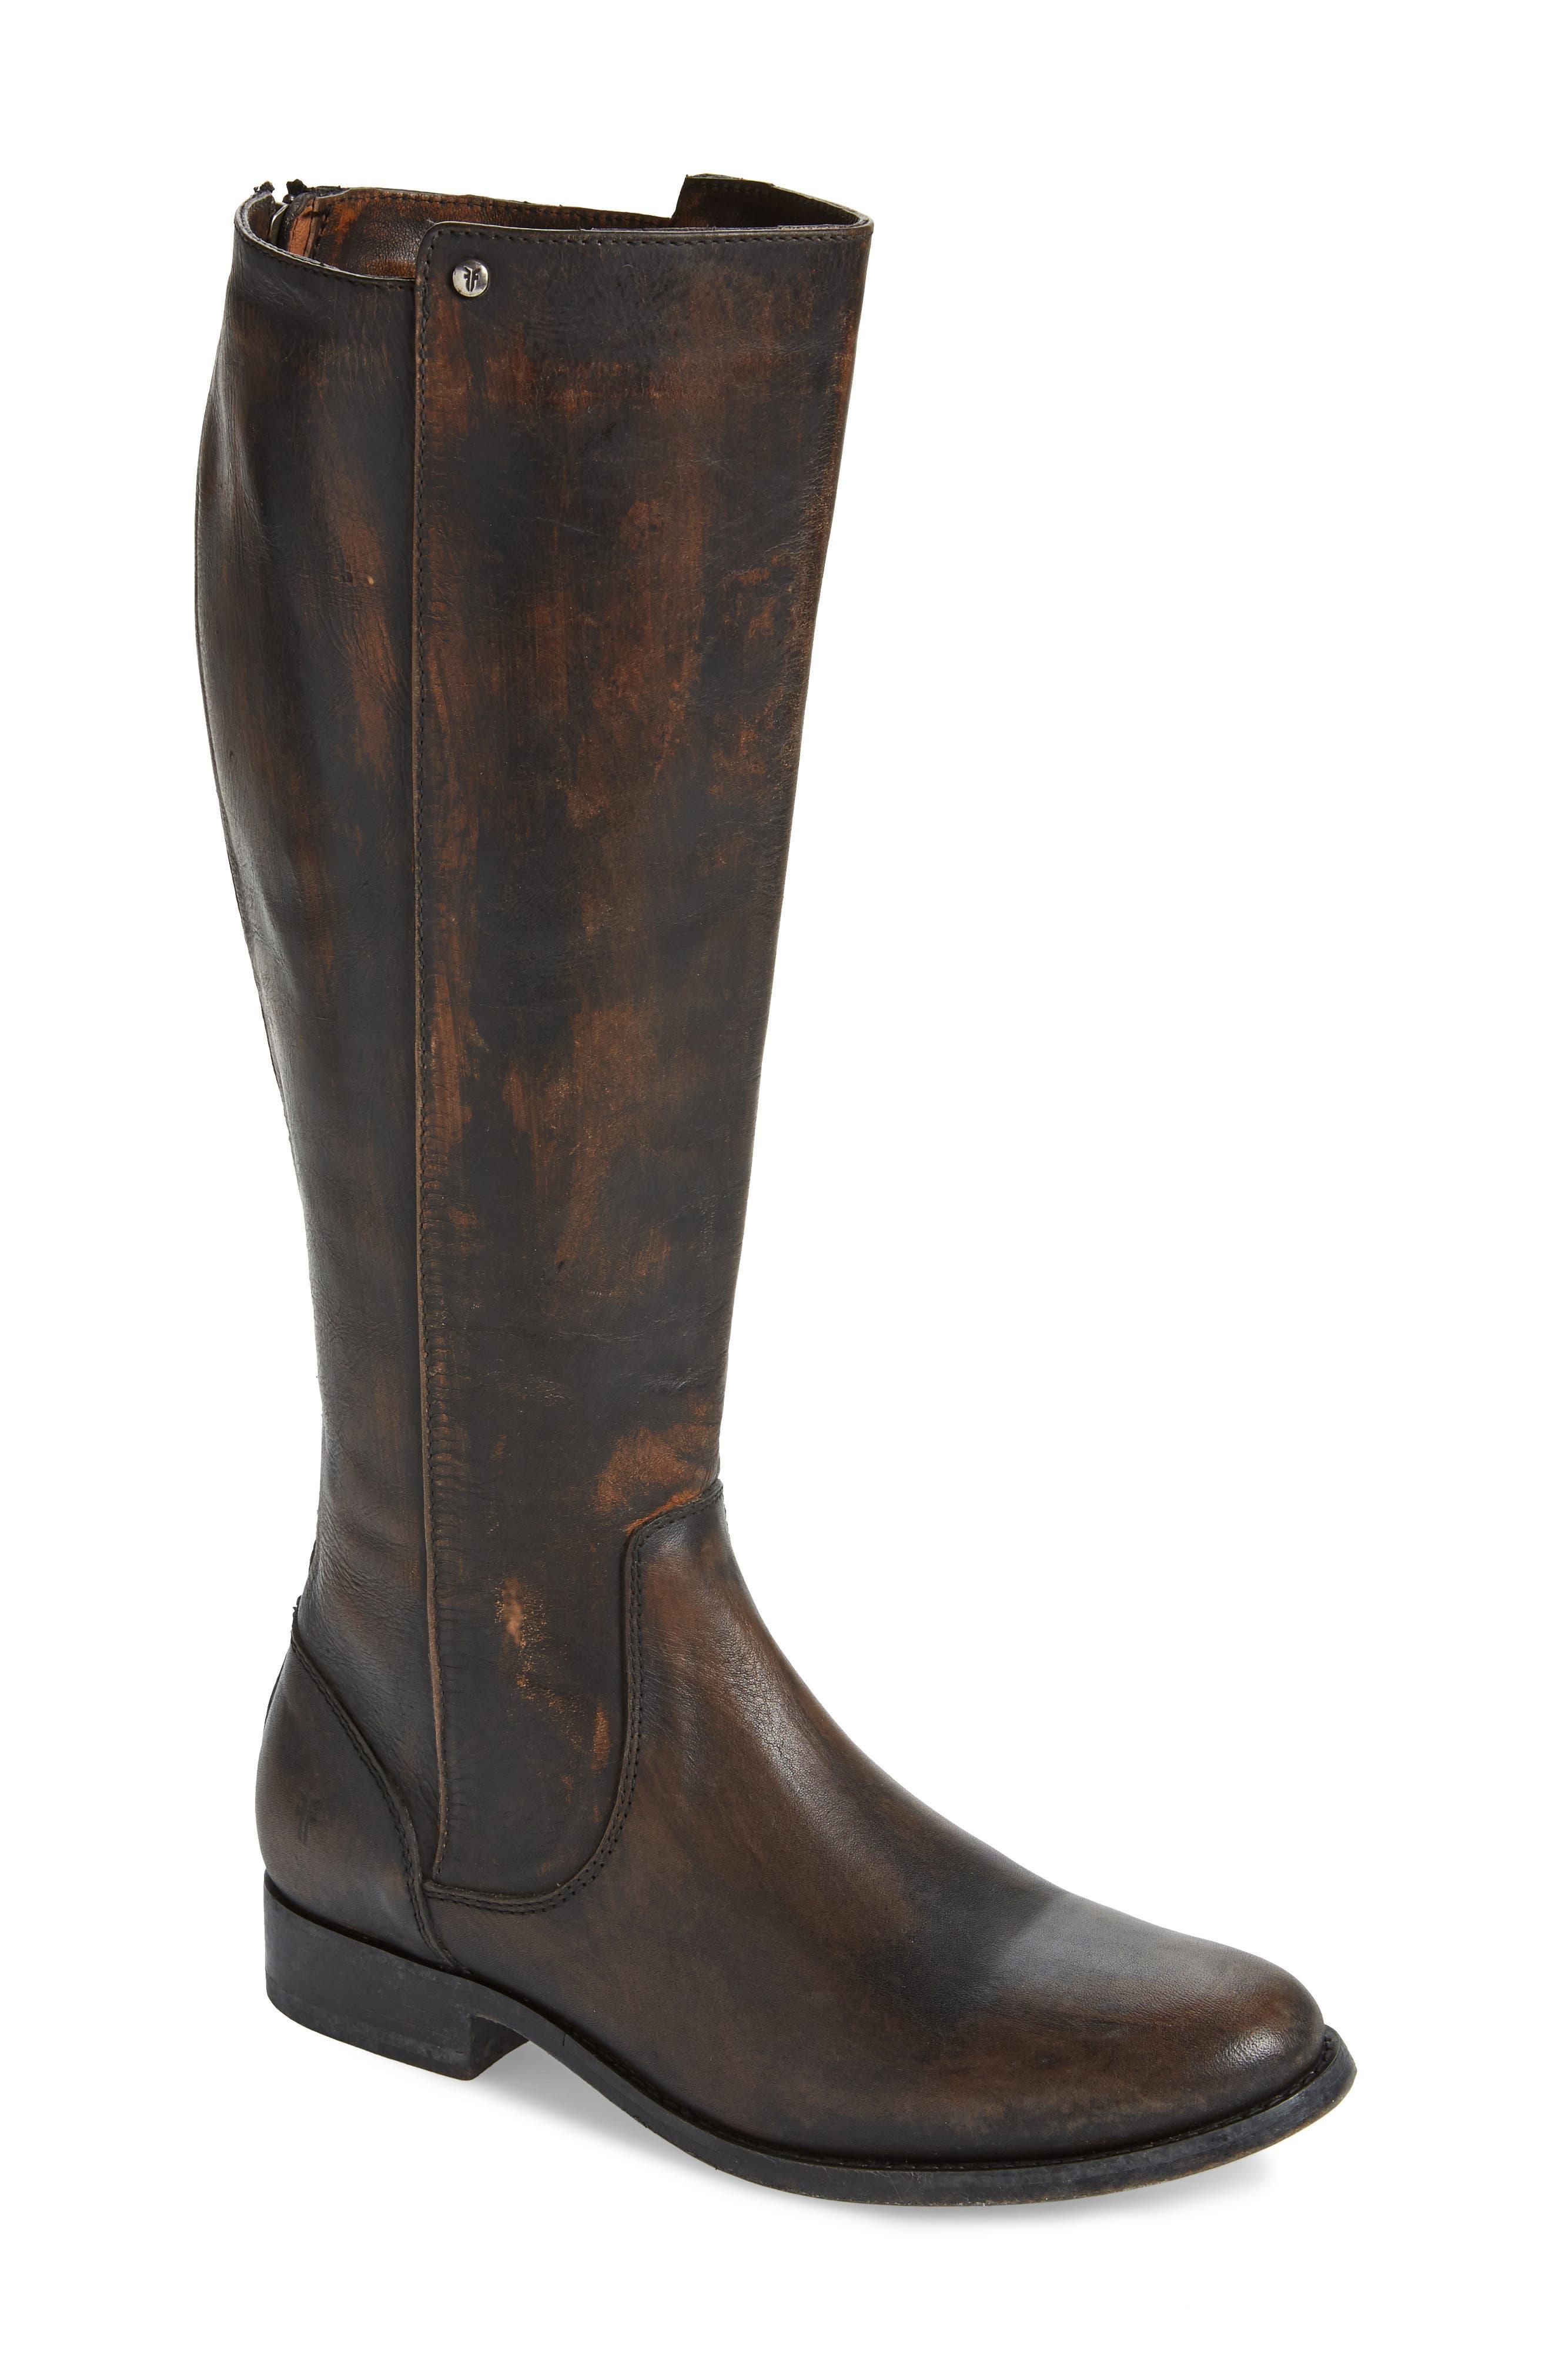 Frye Melissa Stud Knee High Boot- Black